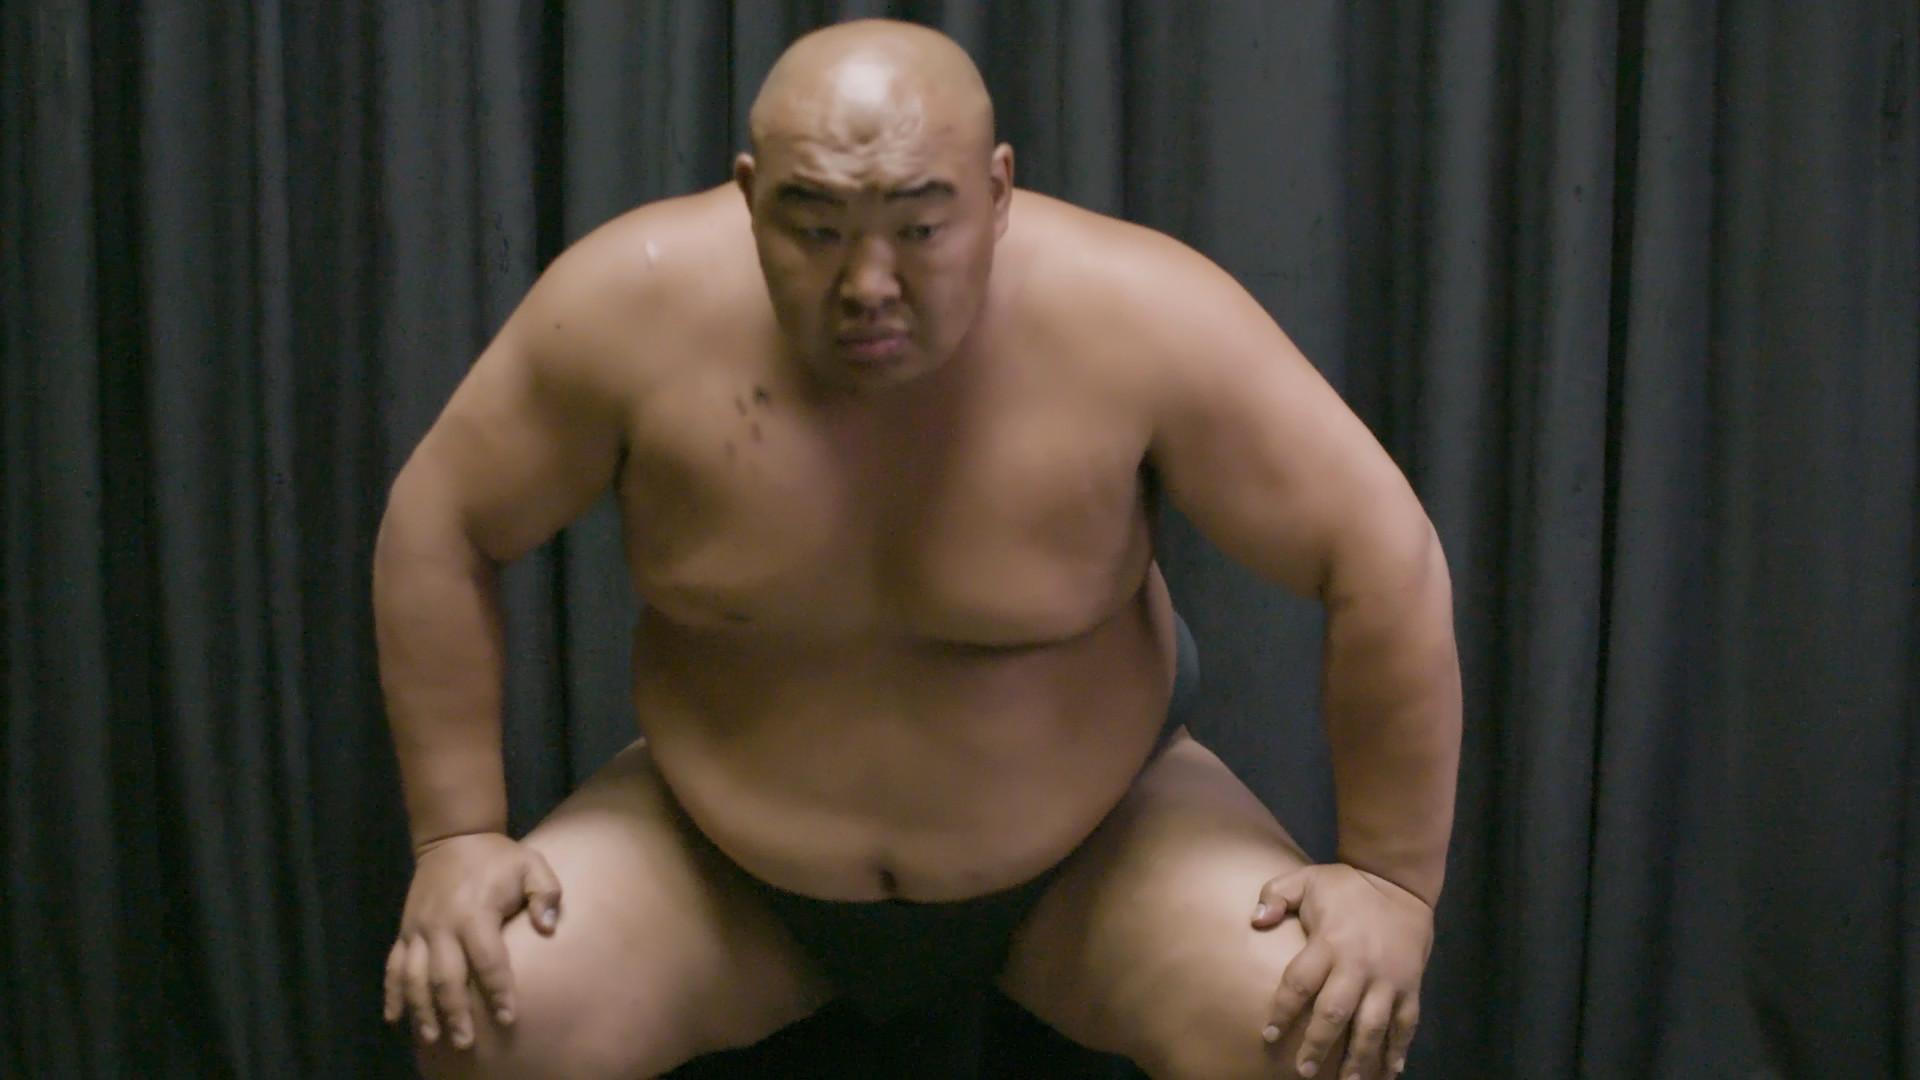 Gay Fetish Xxx  Sumo Wrestler Gay Nude Gifs-4921